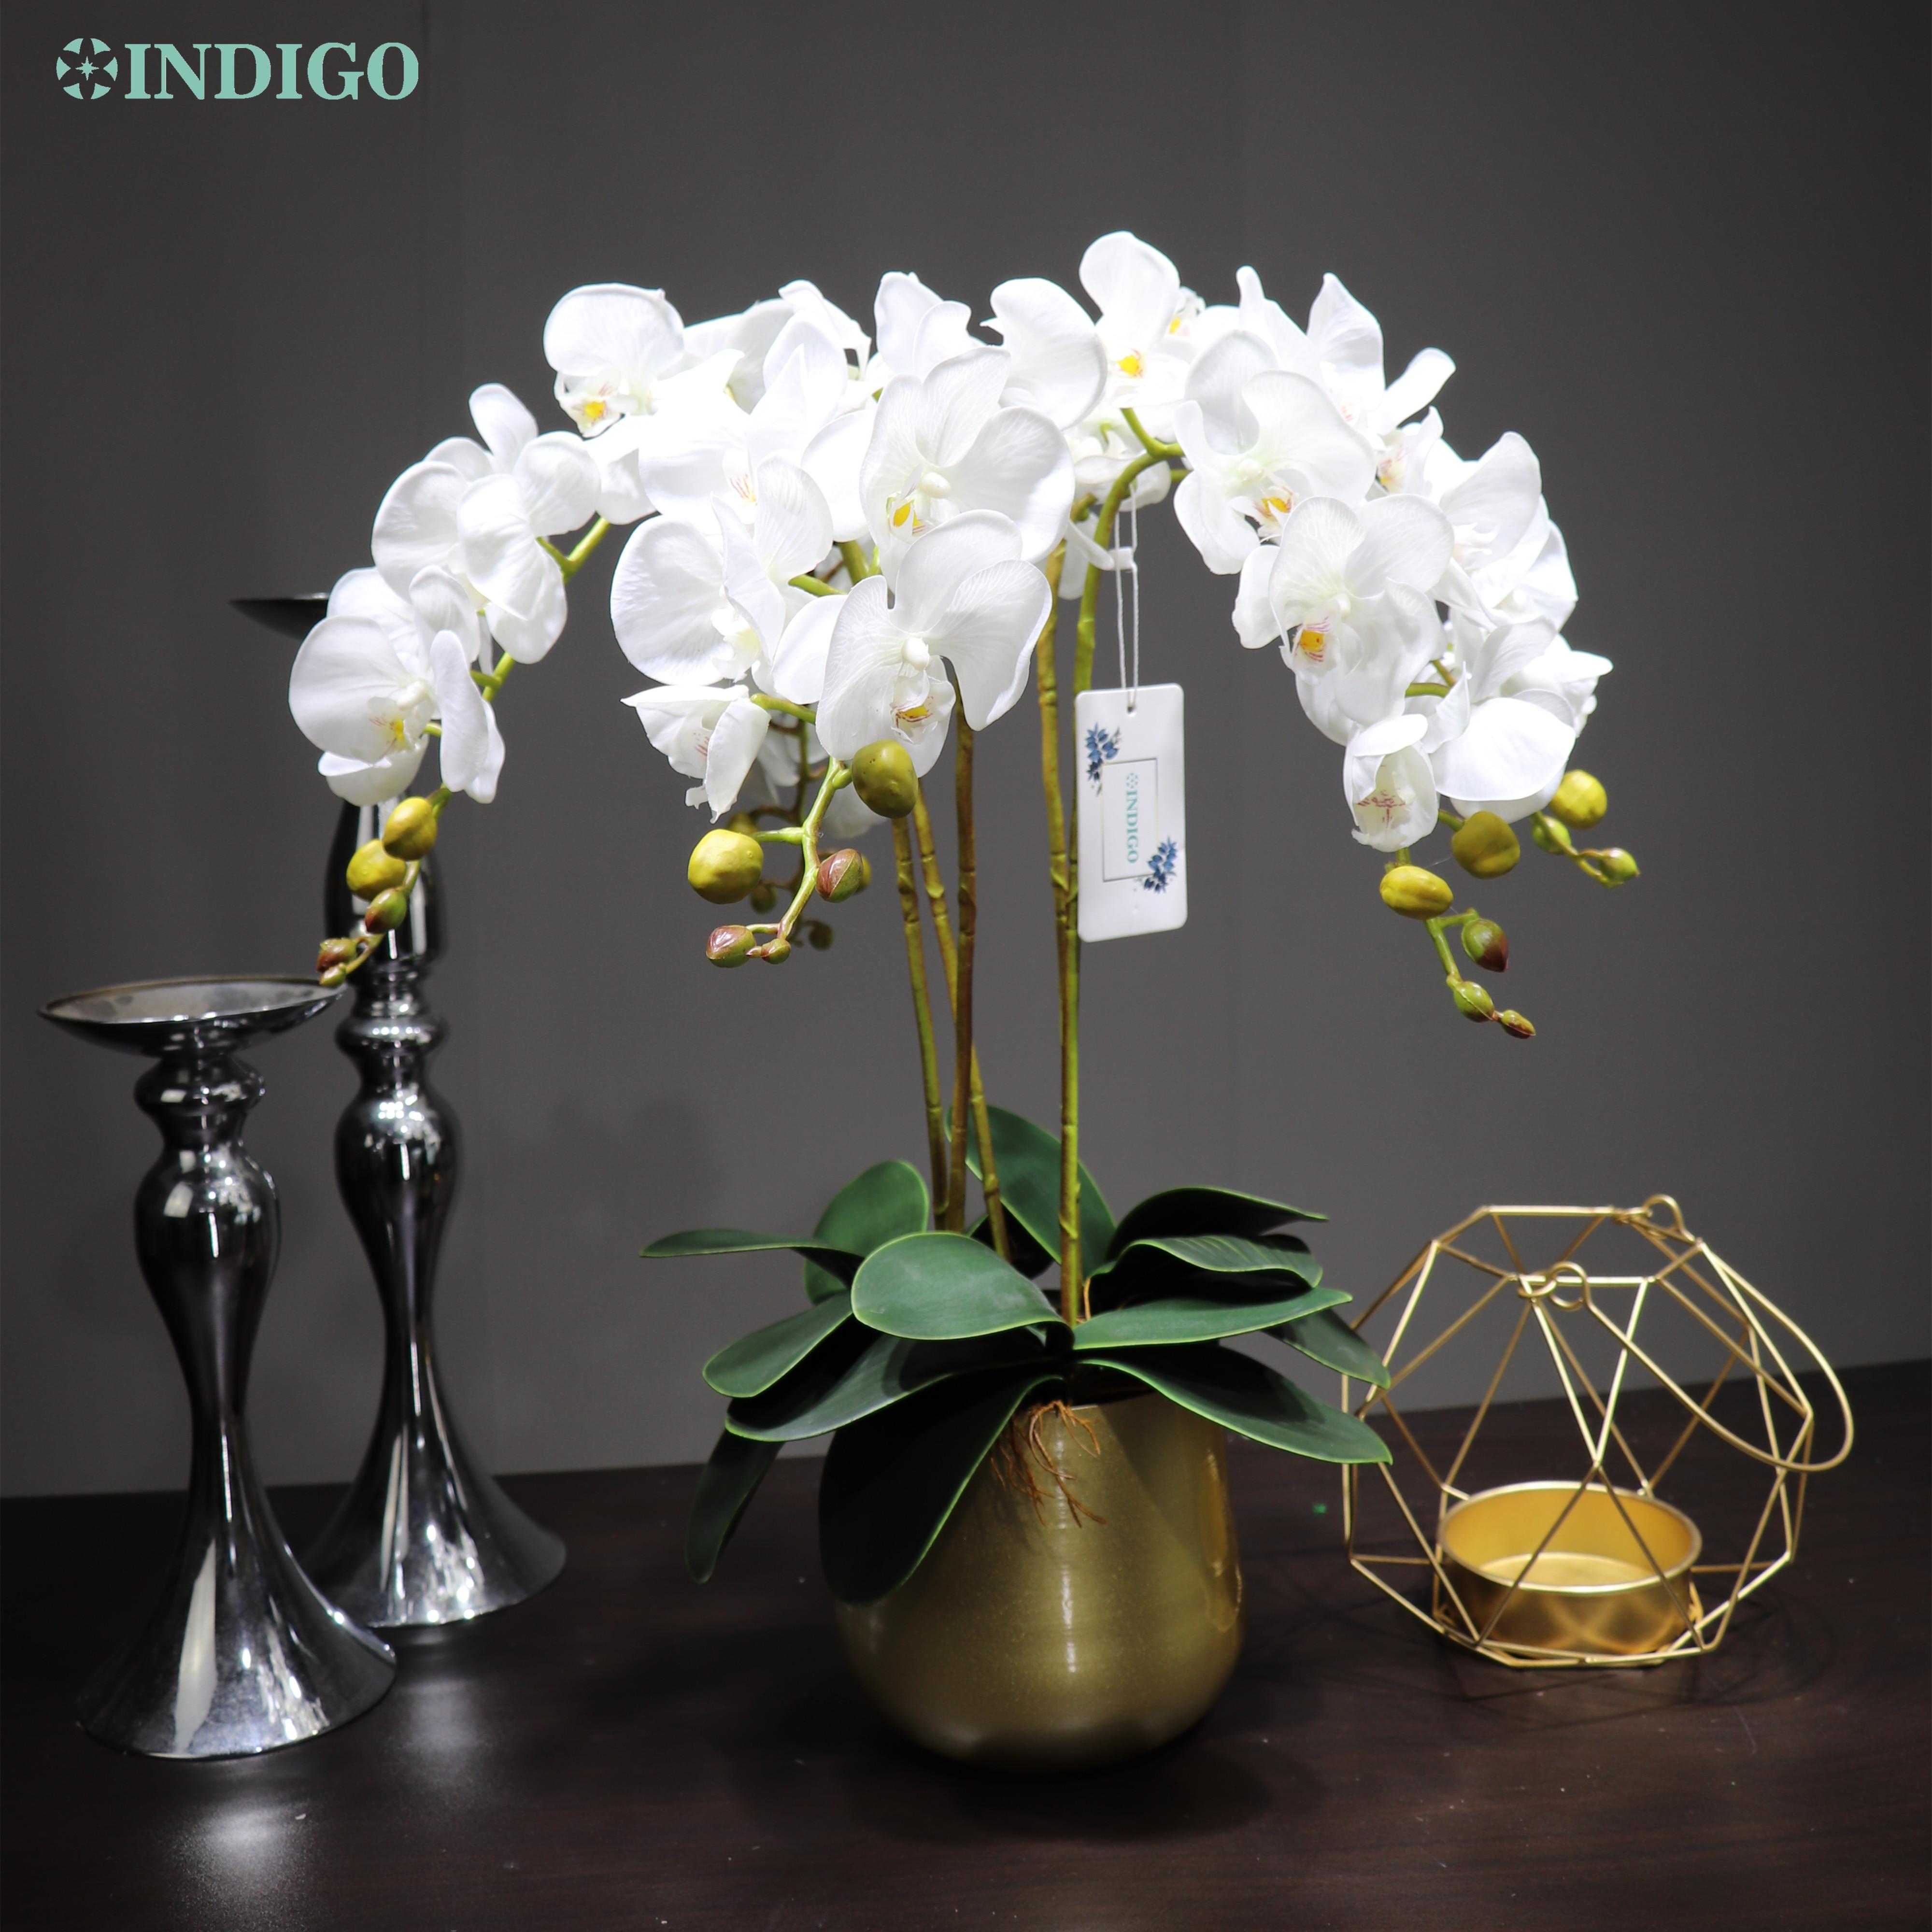 INDIGO - 1 Set DIY arreglo de flores de orquídeas con maceta toque Real flor para oficina de boda Bonsai decoración ShopWindow envío gratis